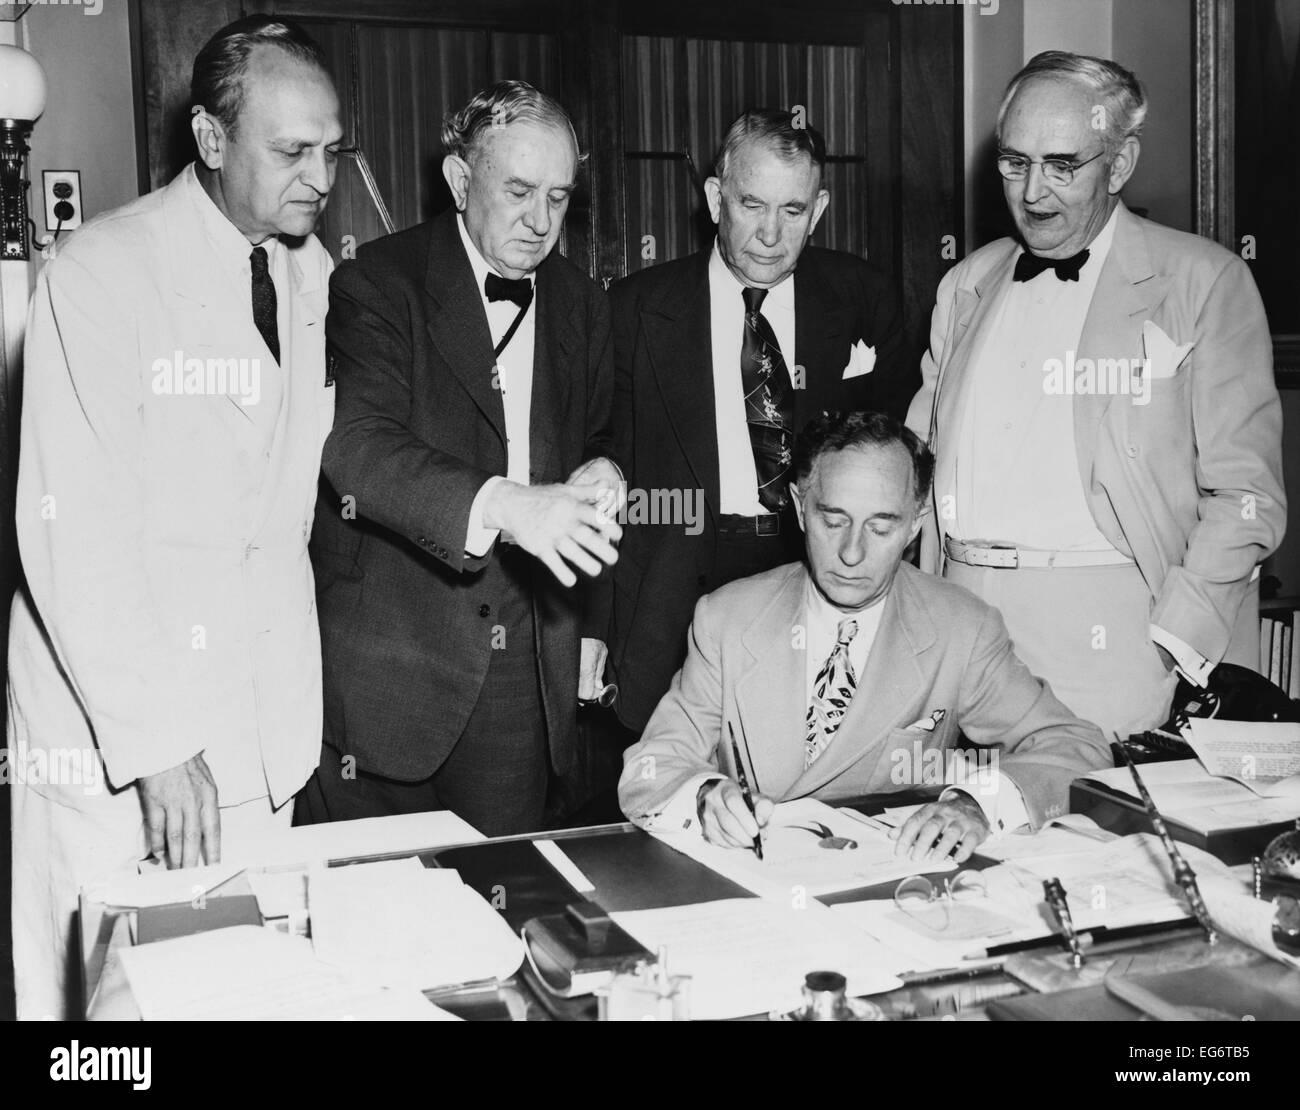 North Atlantic Treaty Organization, NATO, is ratified by U.S. Senate. July 21, 1949. Leslie Biffle, Secretary signs Stock Photo